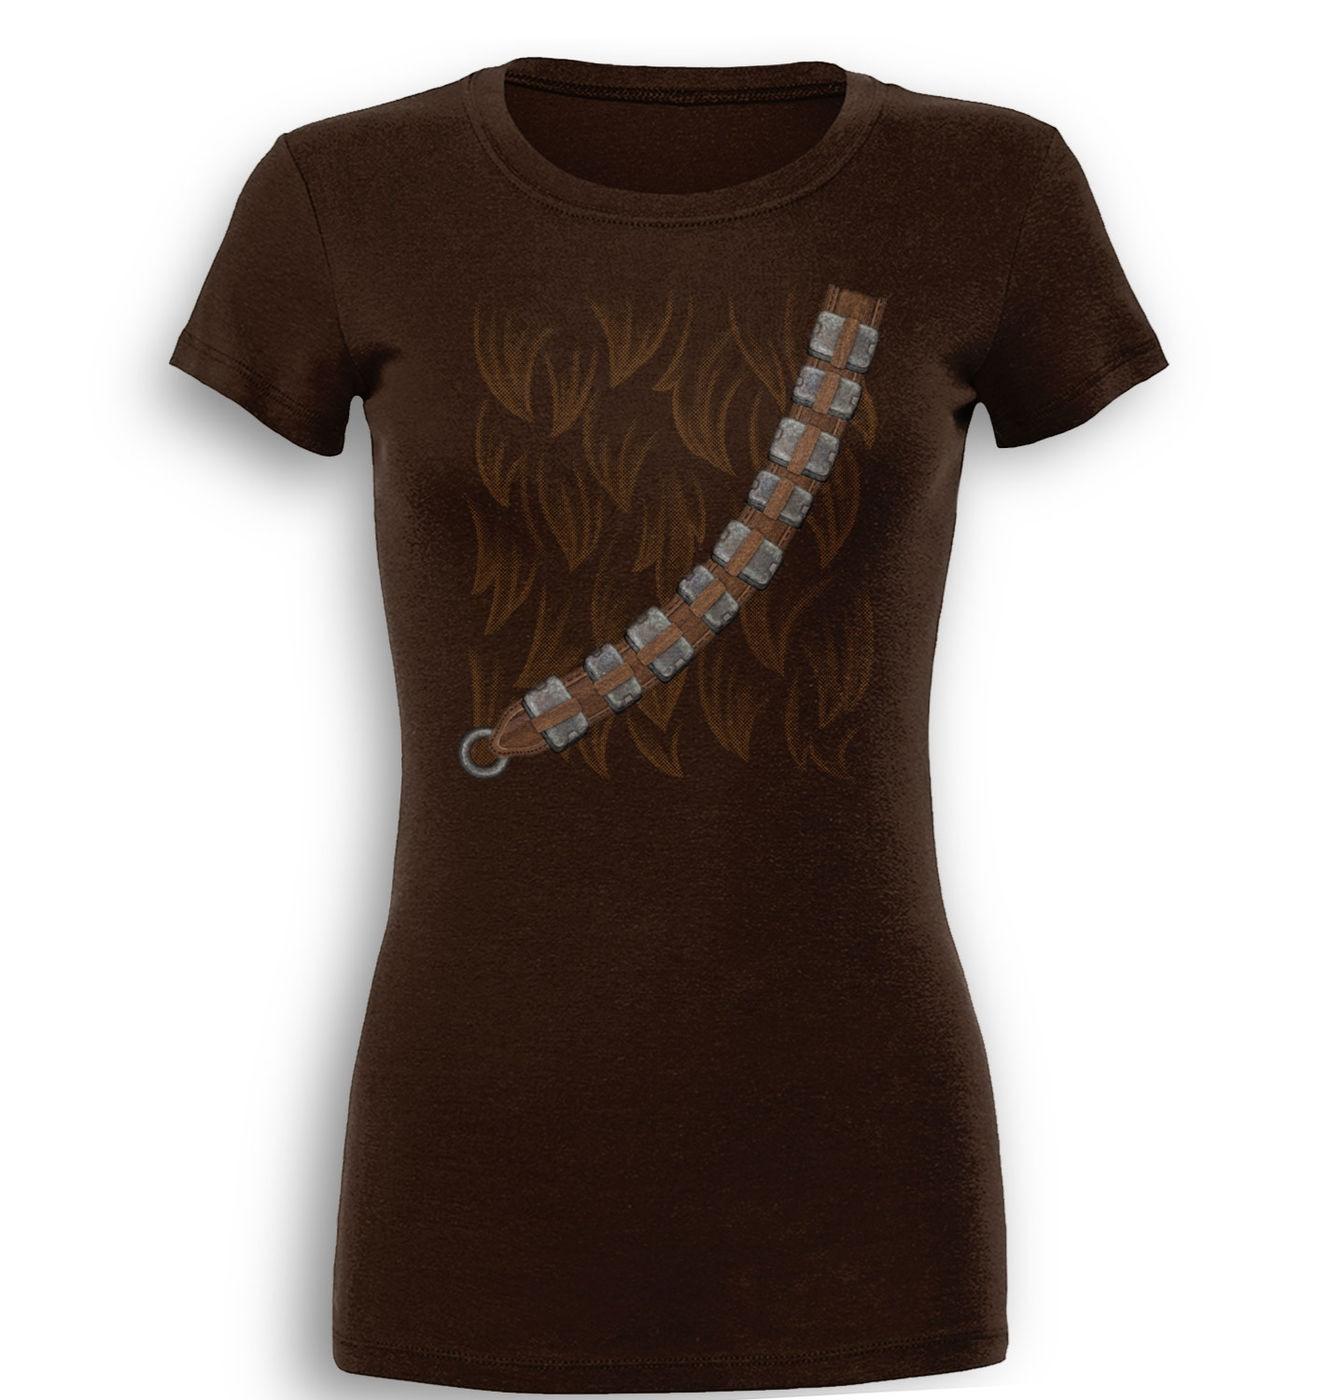 Chewie Costume premium womens t-shirt by Something Geeky